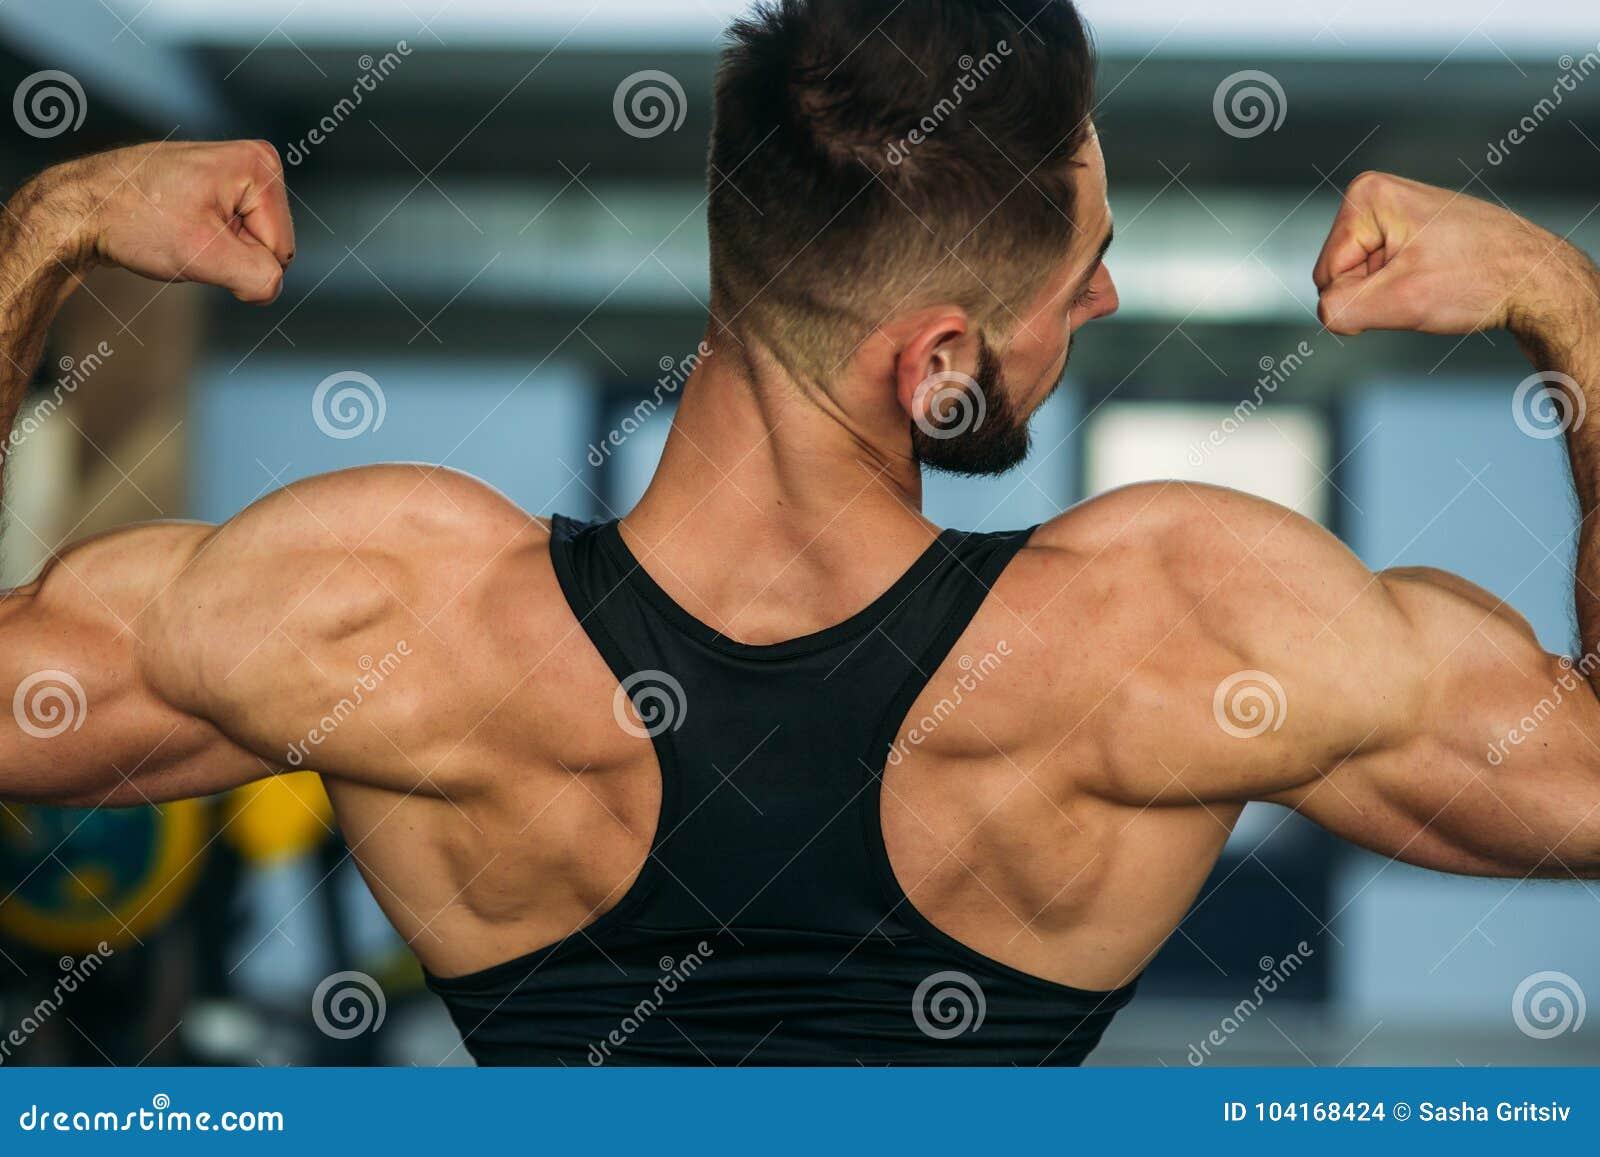 perdita di peso fitness sascha